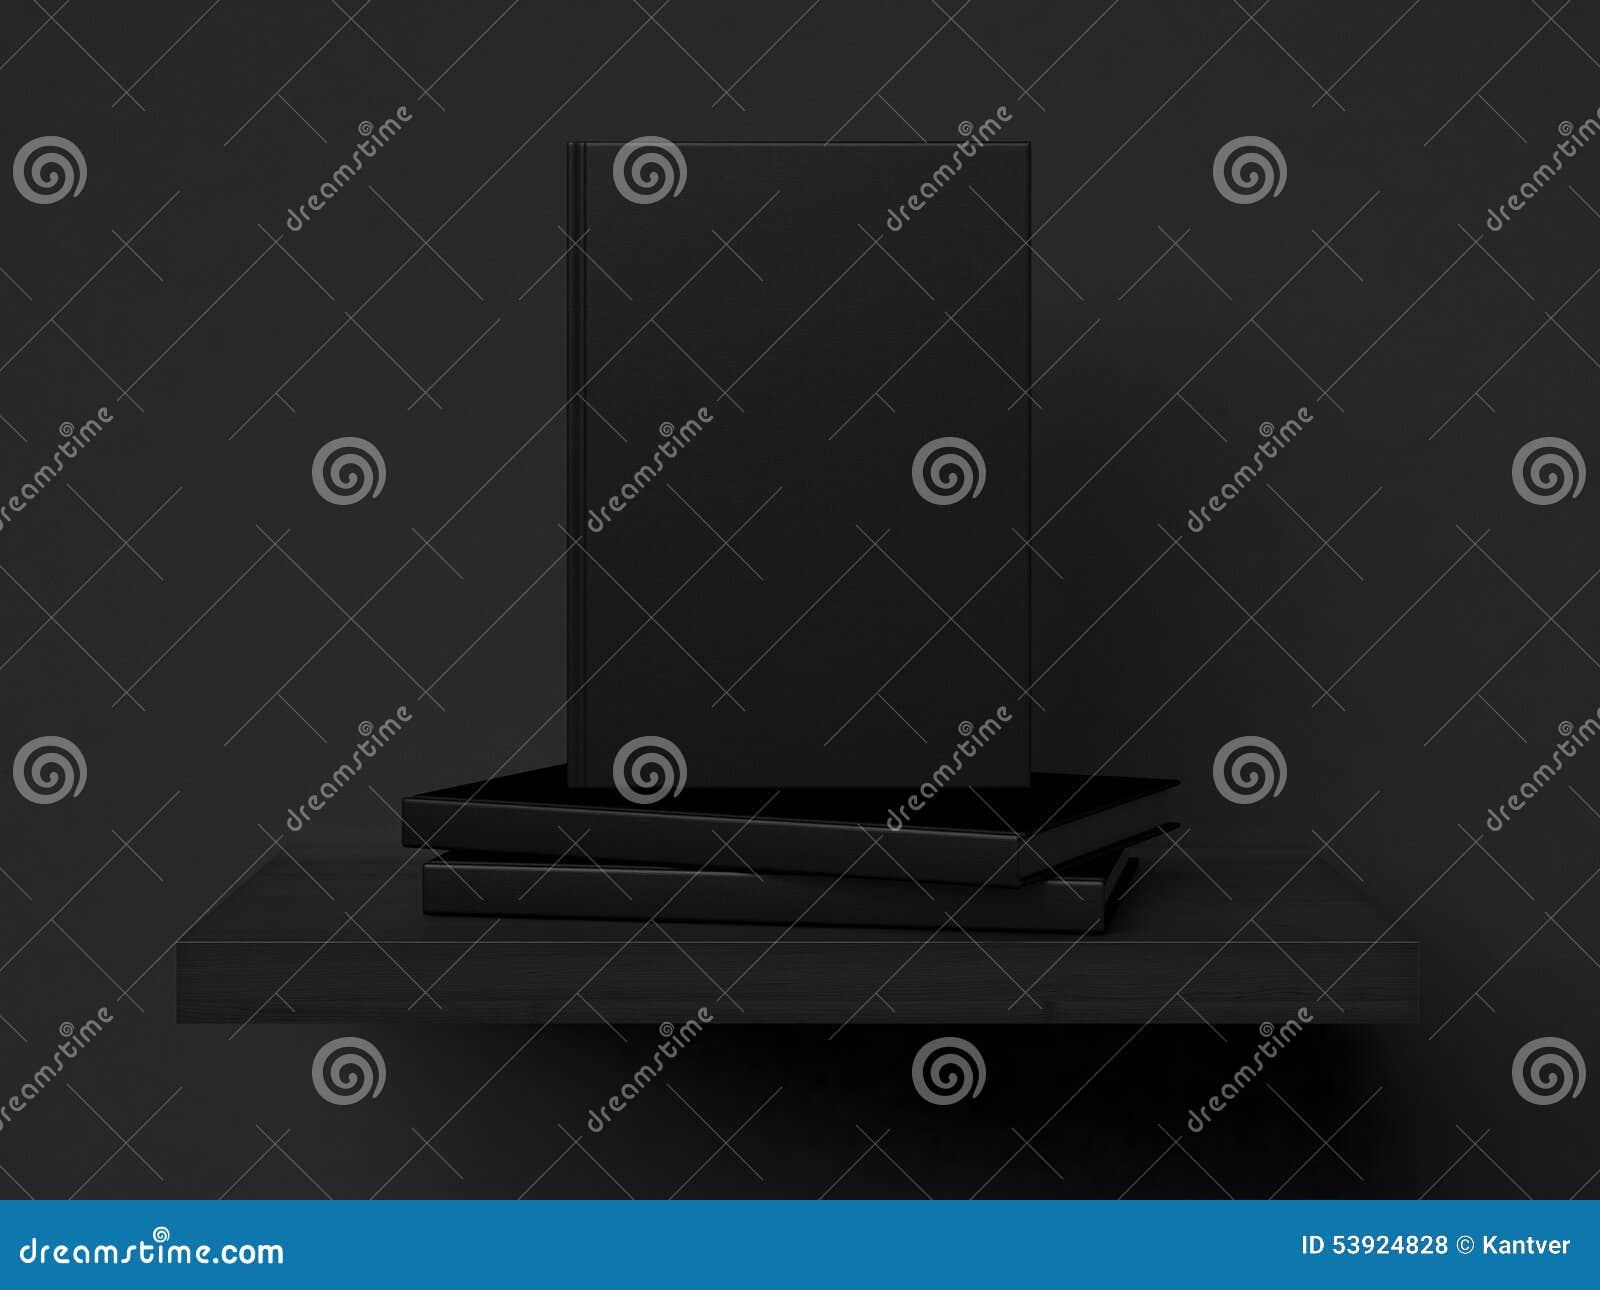 Three blank books on a shelf. 3d rendering